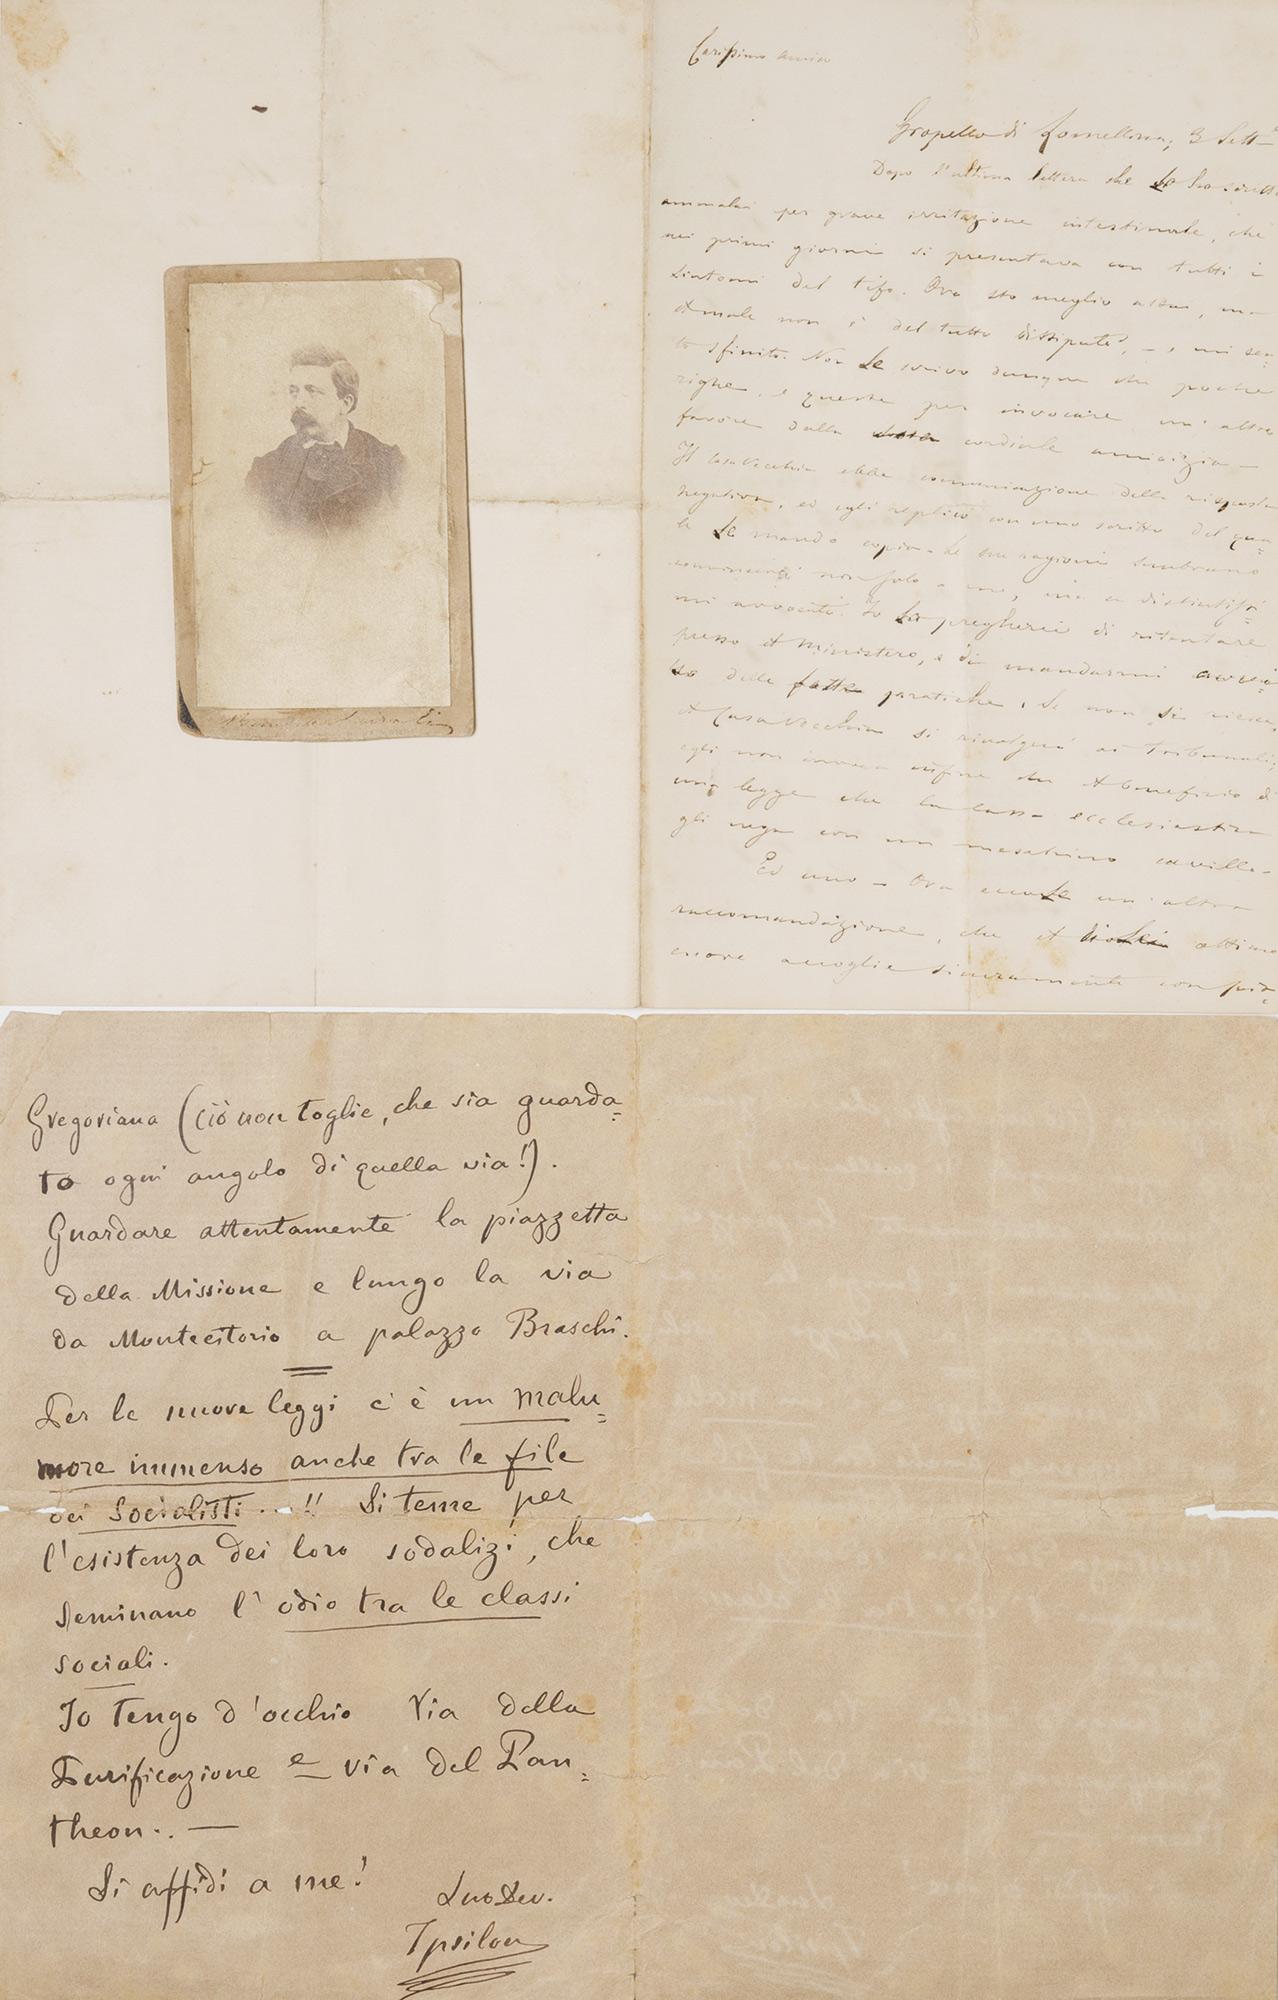 Lettera autografa firmata